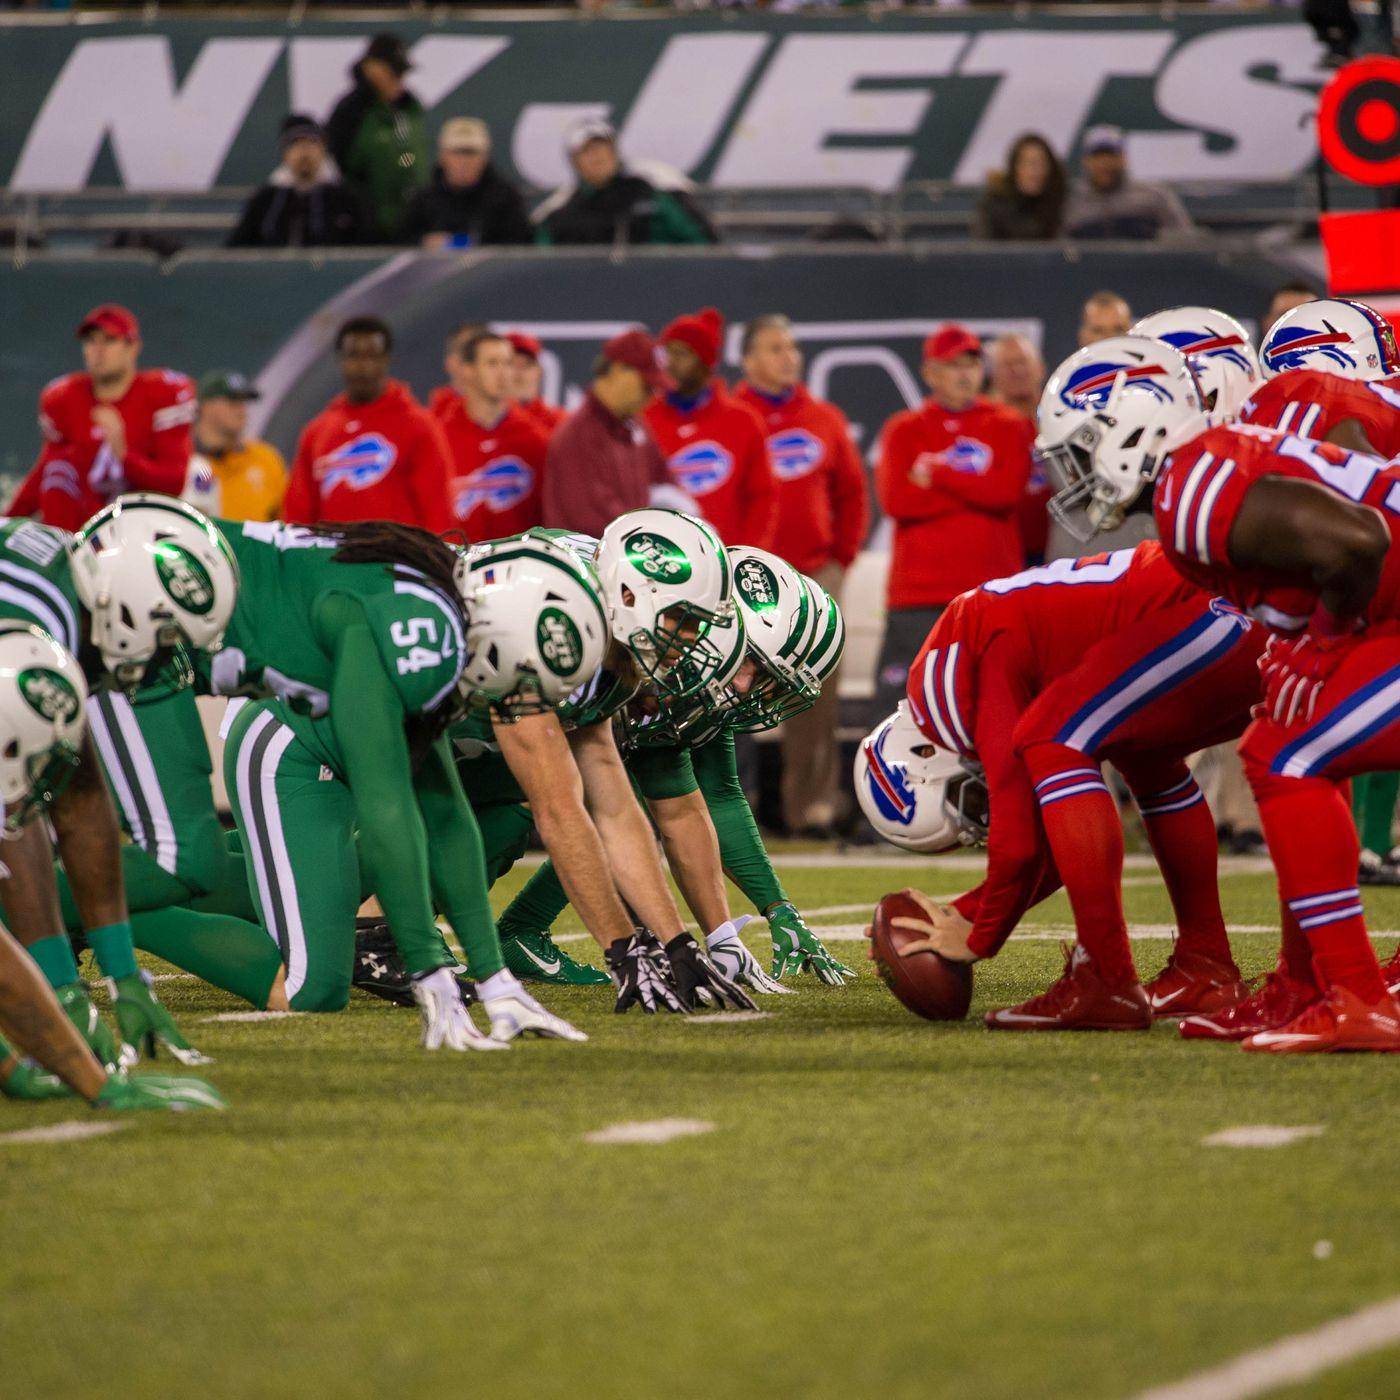 New York Jets vs. Buffalo Bills - Thursday Night Football - Dawgs ...